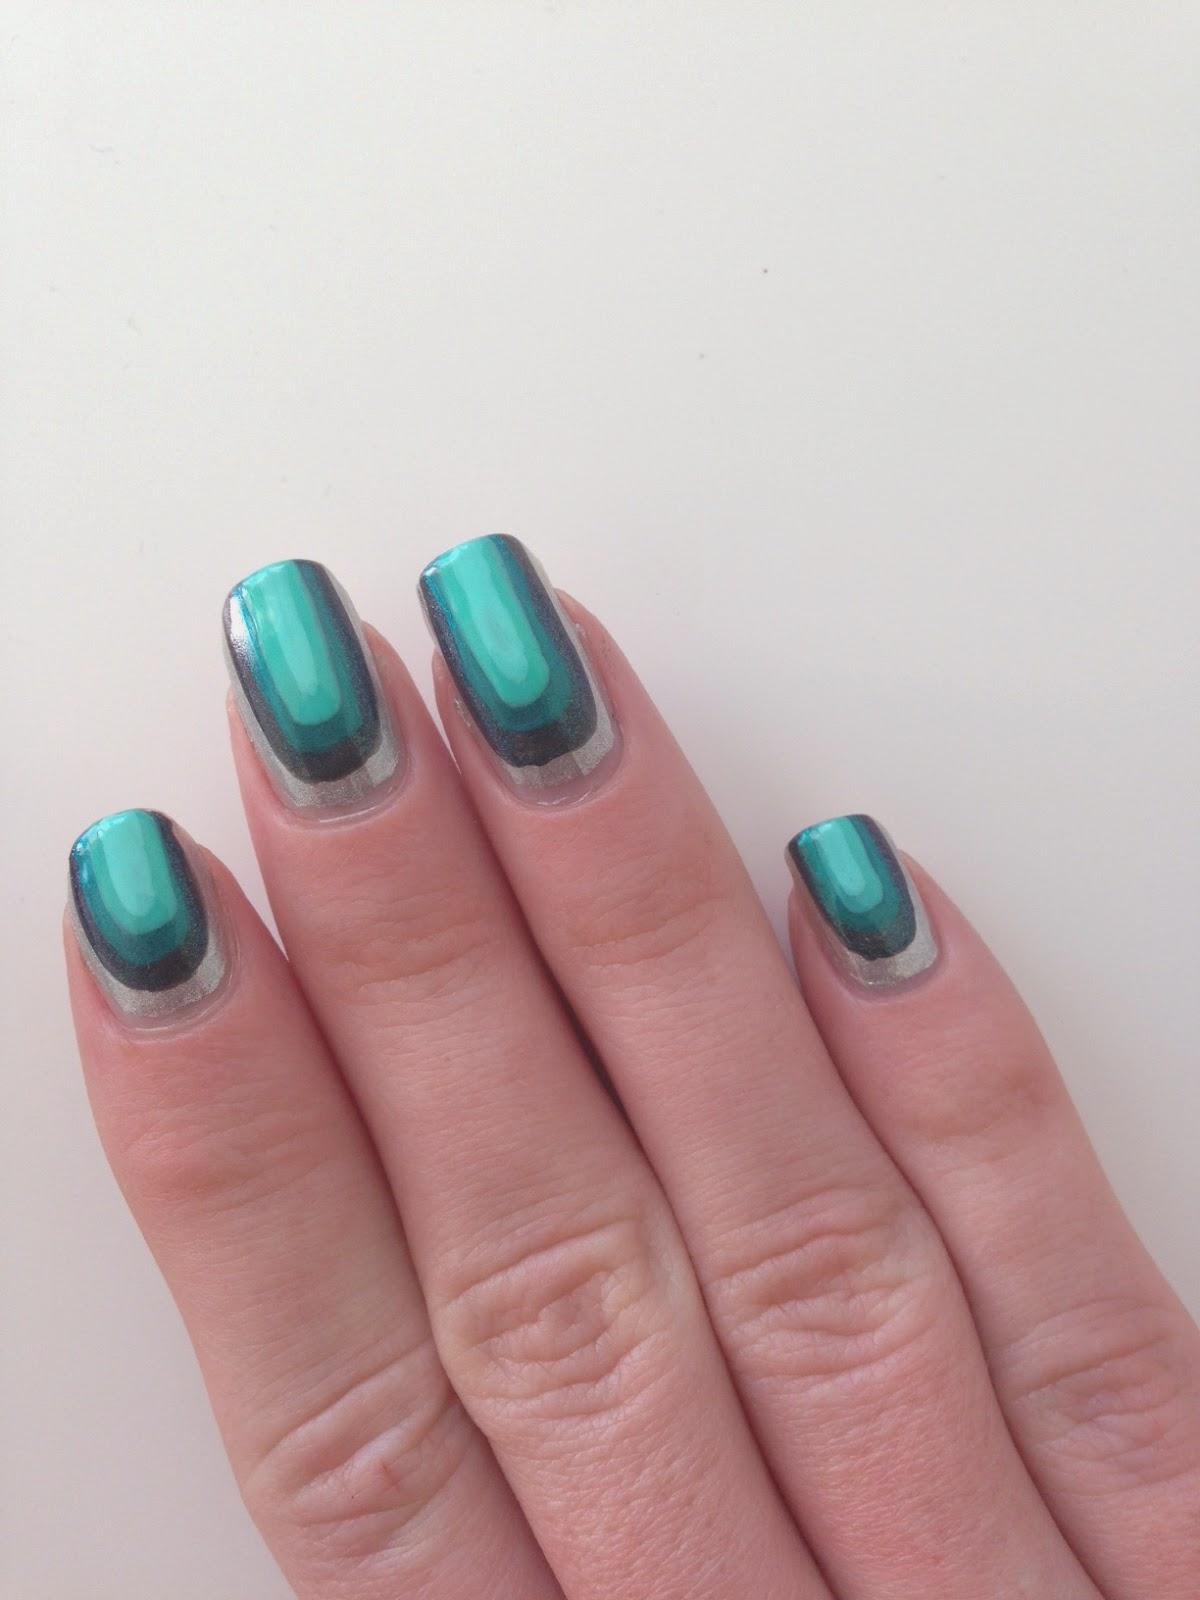 nail art facile au pinceau